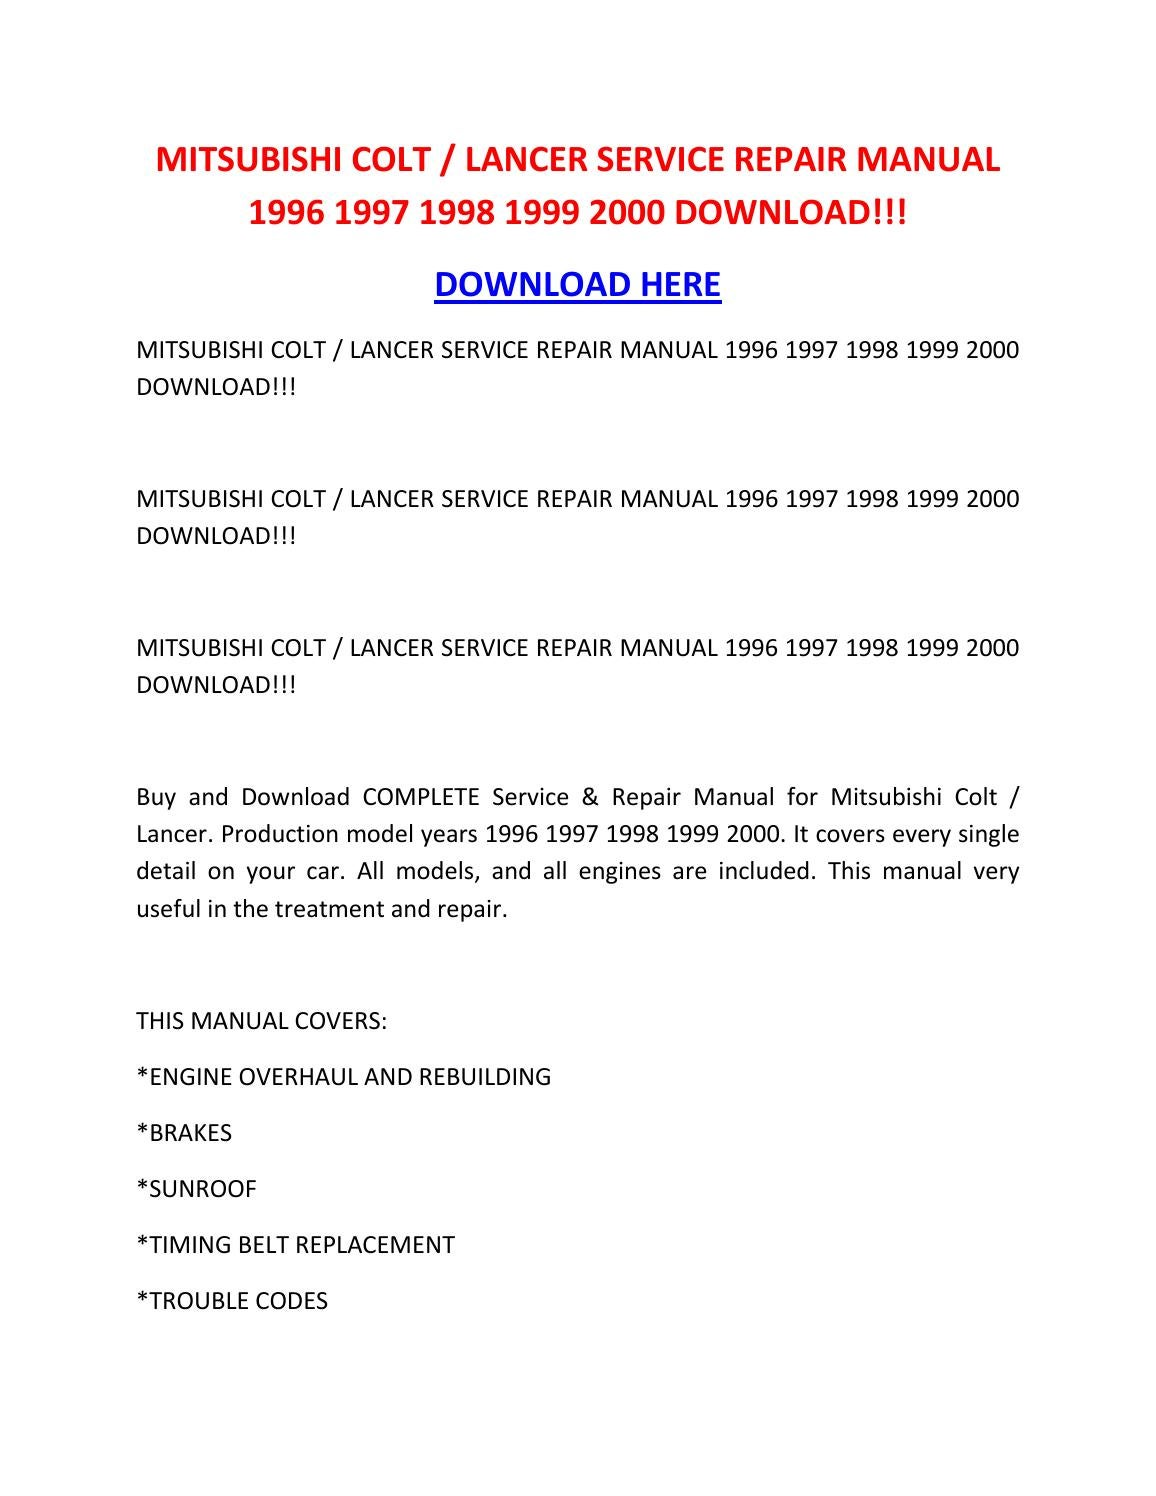 Mitsubishi Colt Lancer Service Repair Manual 1996 1997